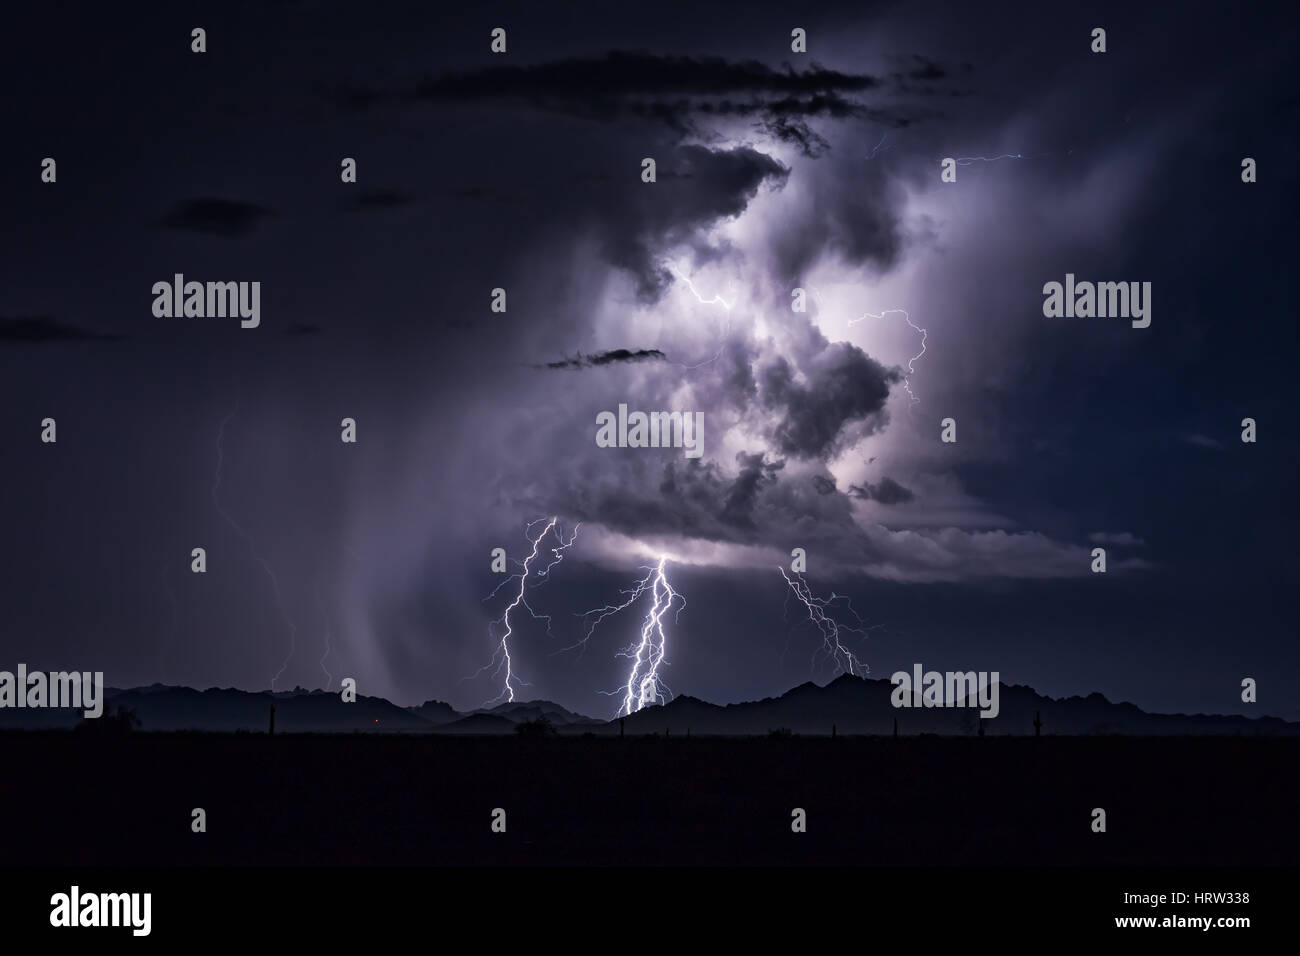 Lightning bolts striking - Stock Image